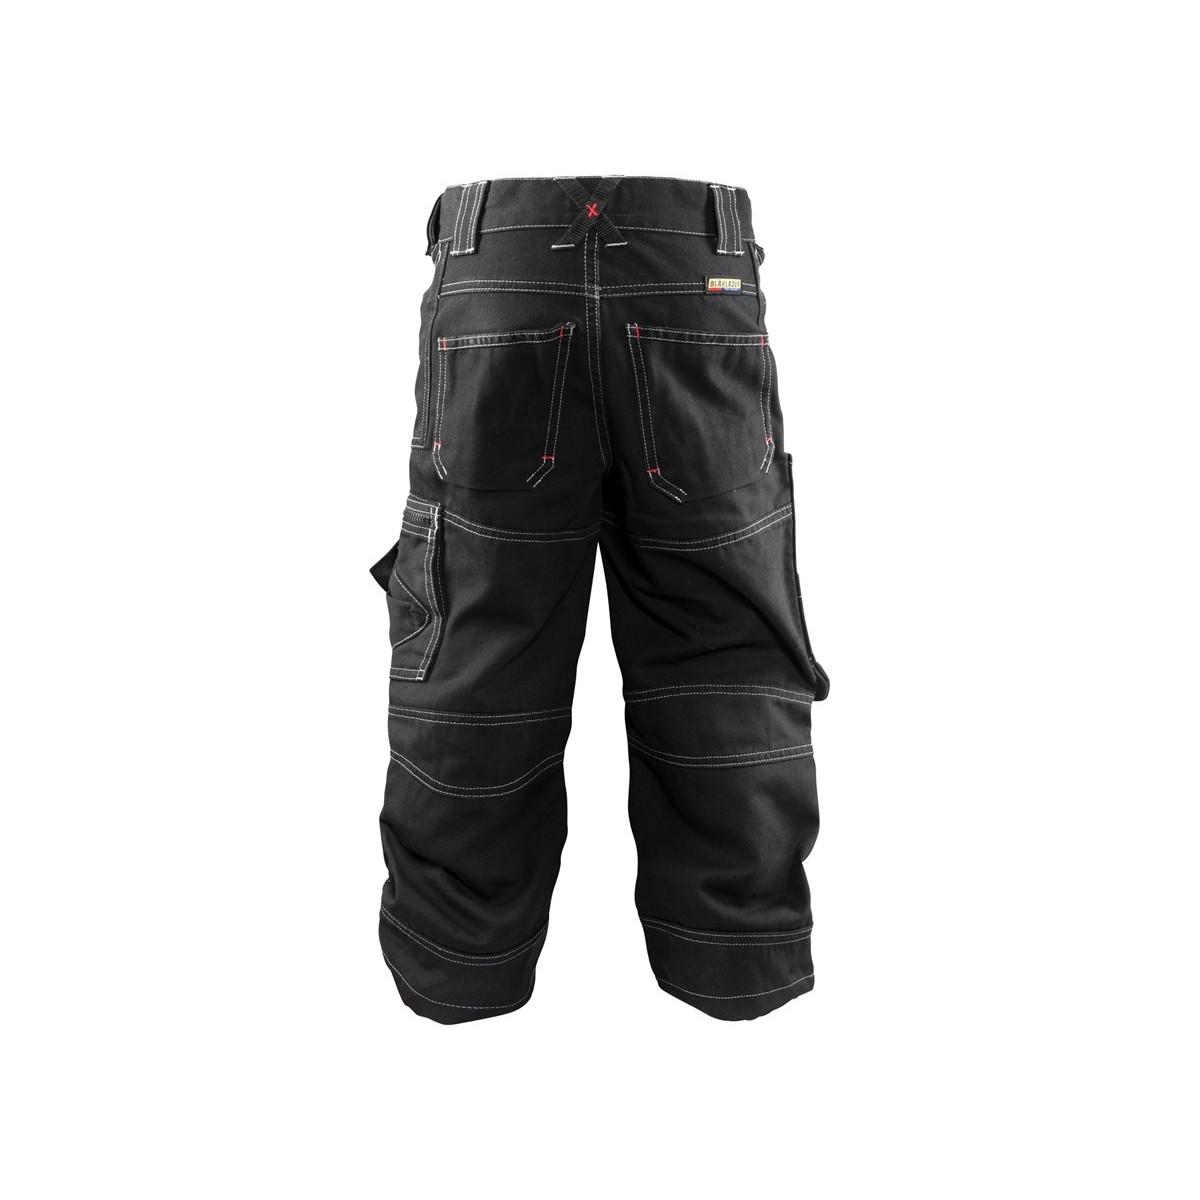 0305edf1609b6 Pantalon BLAKLADER X1500 enfant léger 100% toile de coton